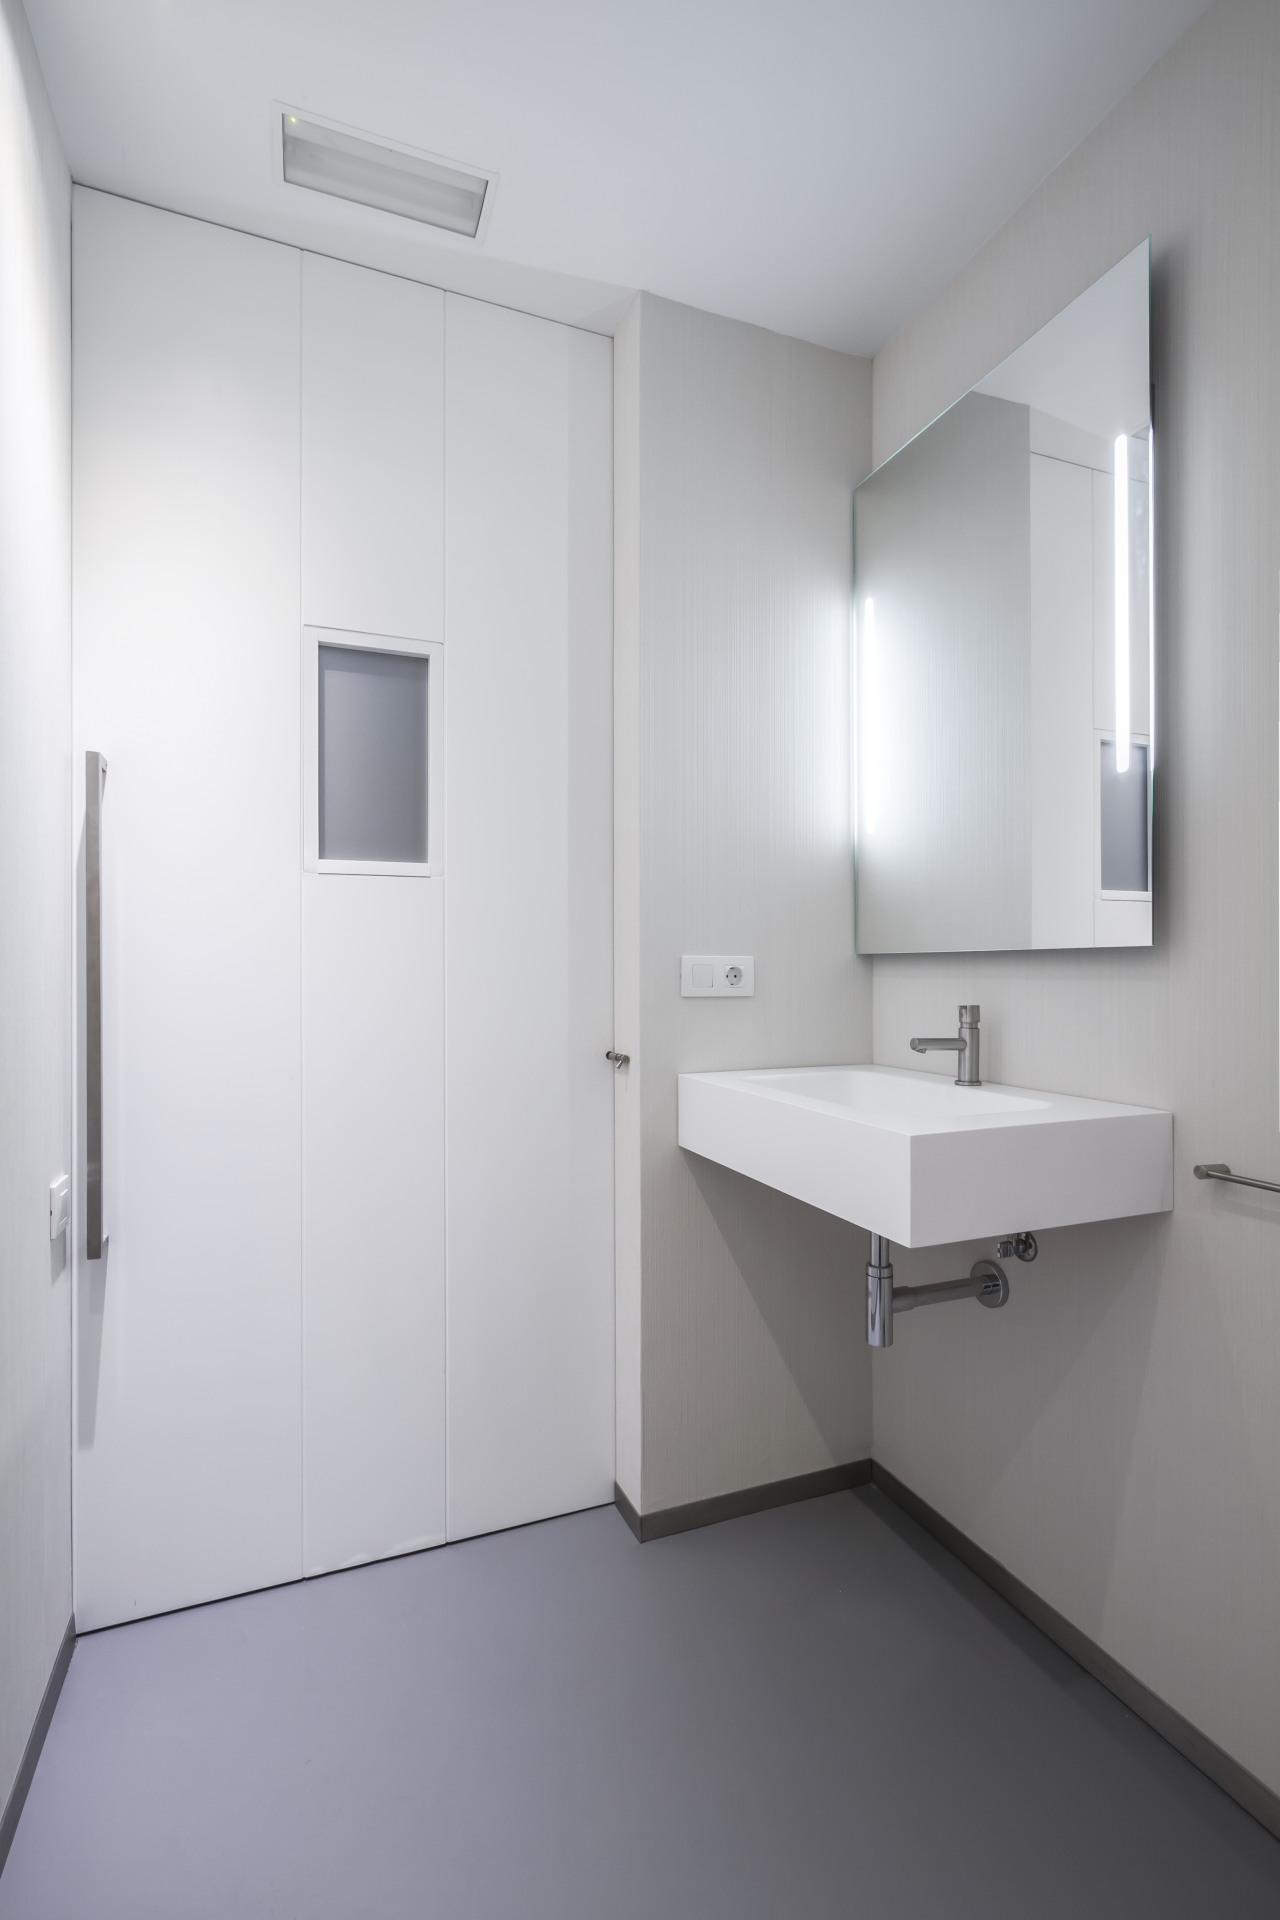 fotografia-arquitectura-valencia-german-cabo-hernandez-clinica (14)